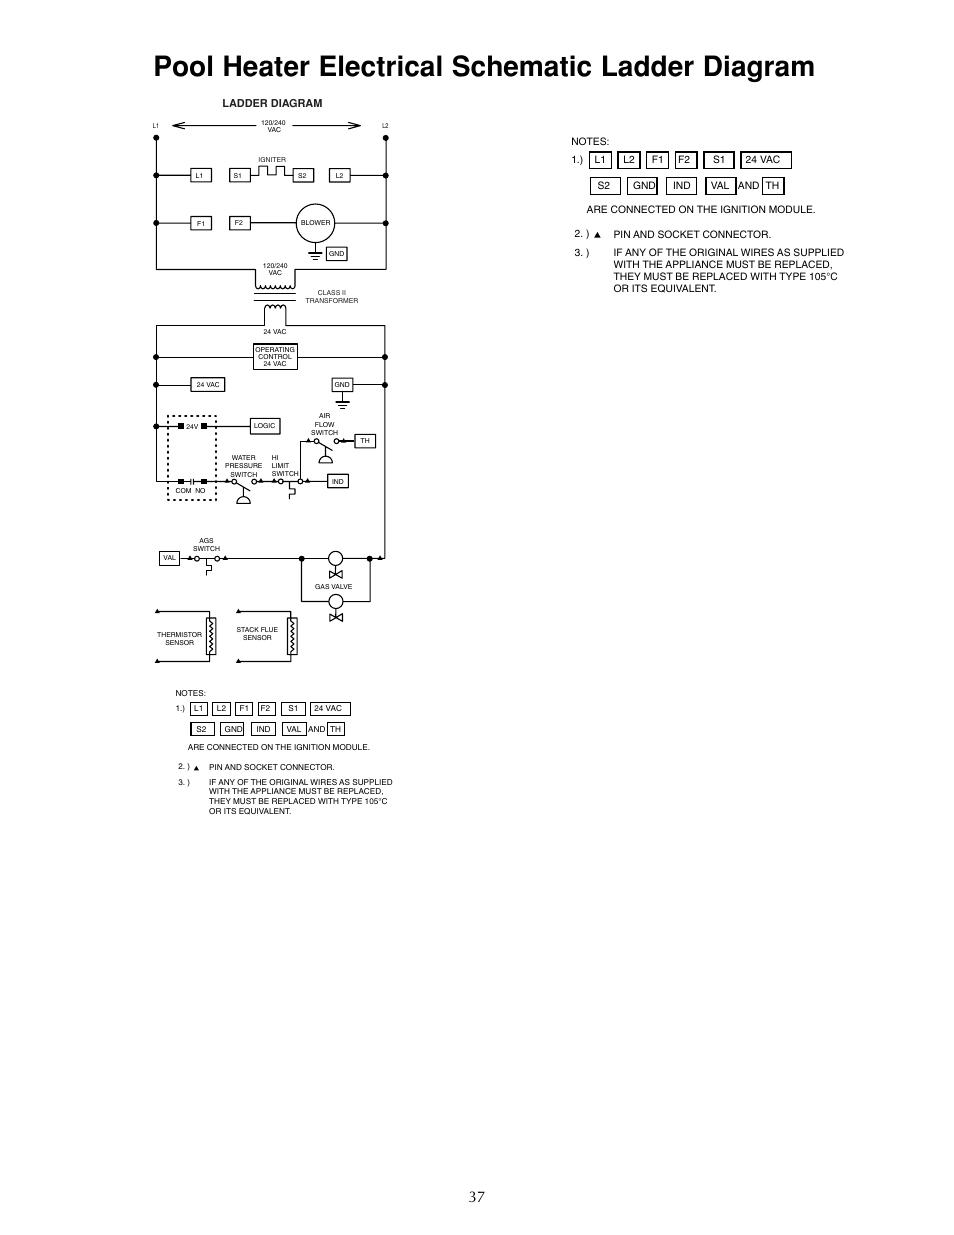 Pool Heater Electrical Schematic Ladder Diagram Sta Rite